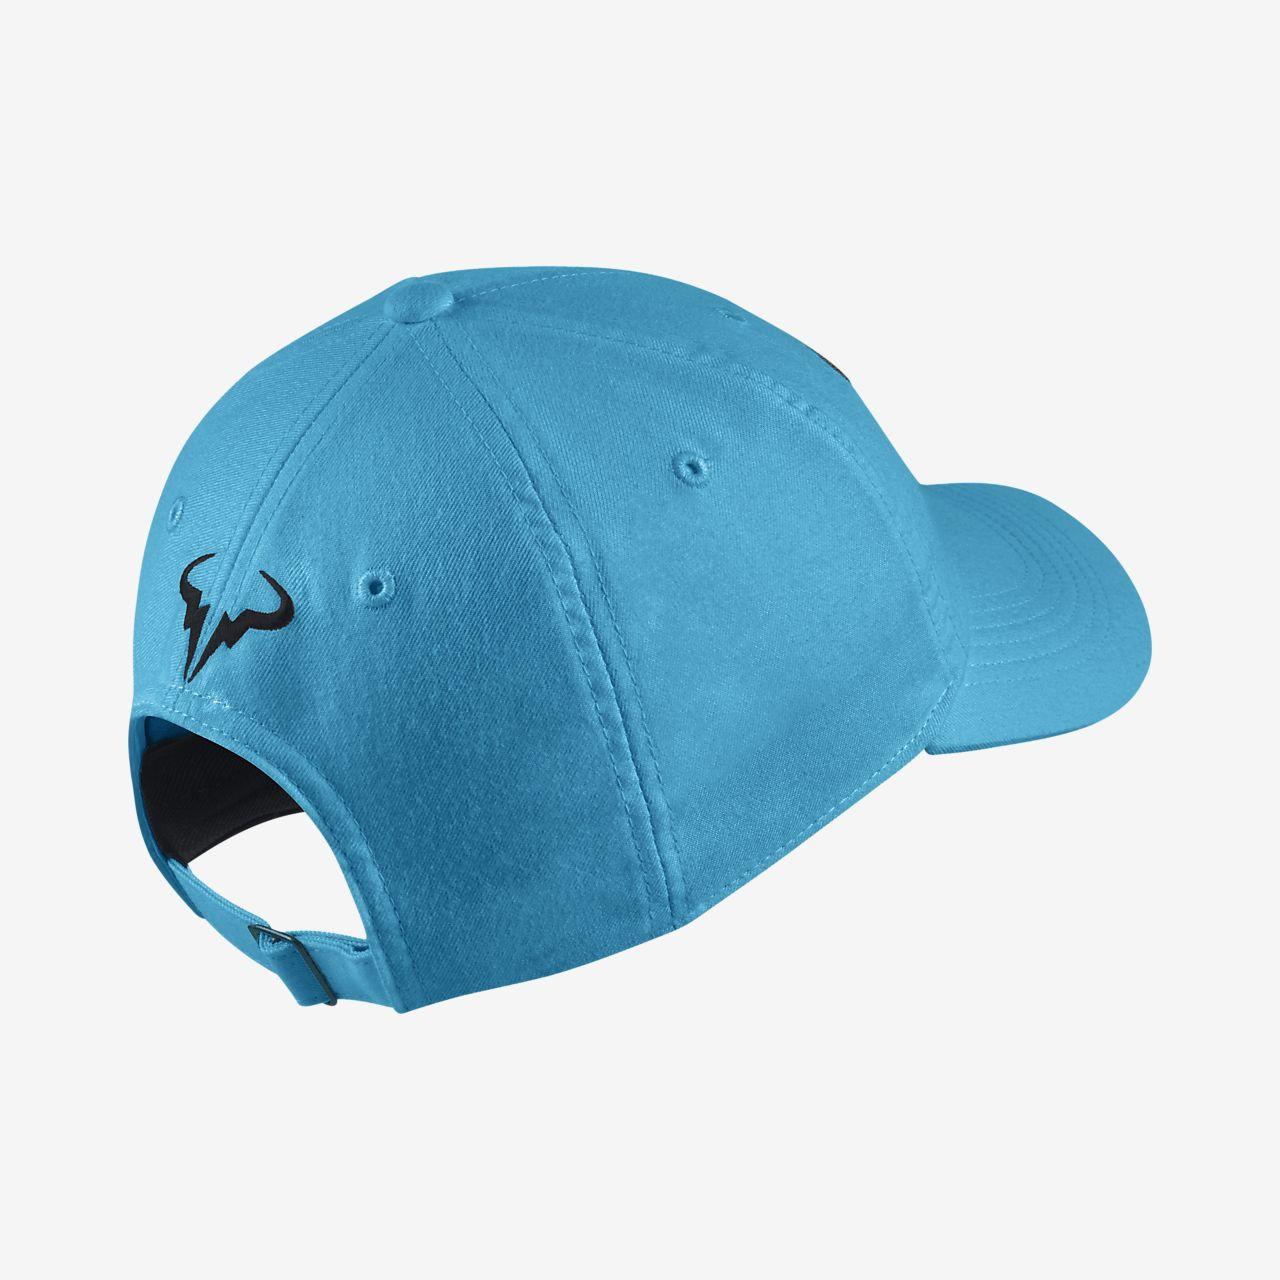 ce652fcff9ace NikeCourt AeroBill Rafa Heritage86 Tennis Hat. Nike.com ZA